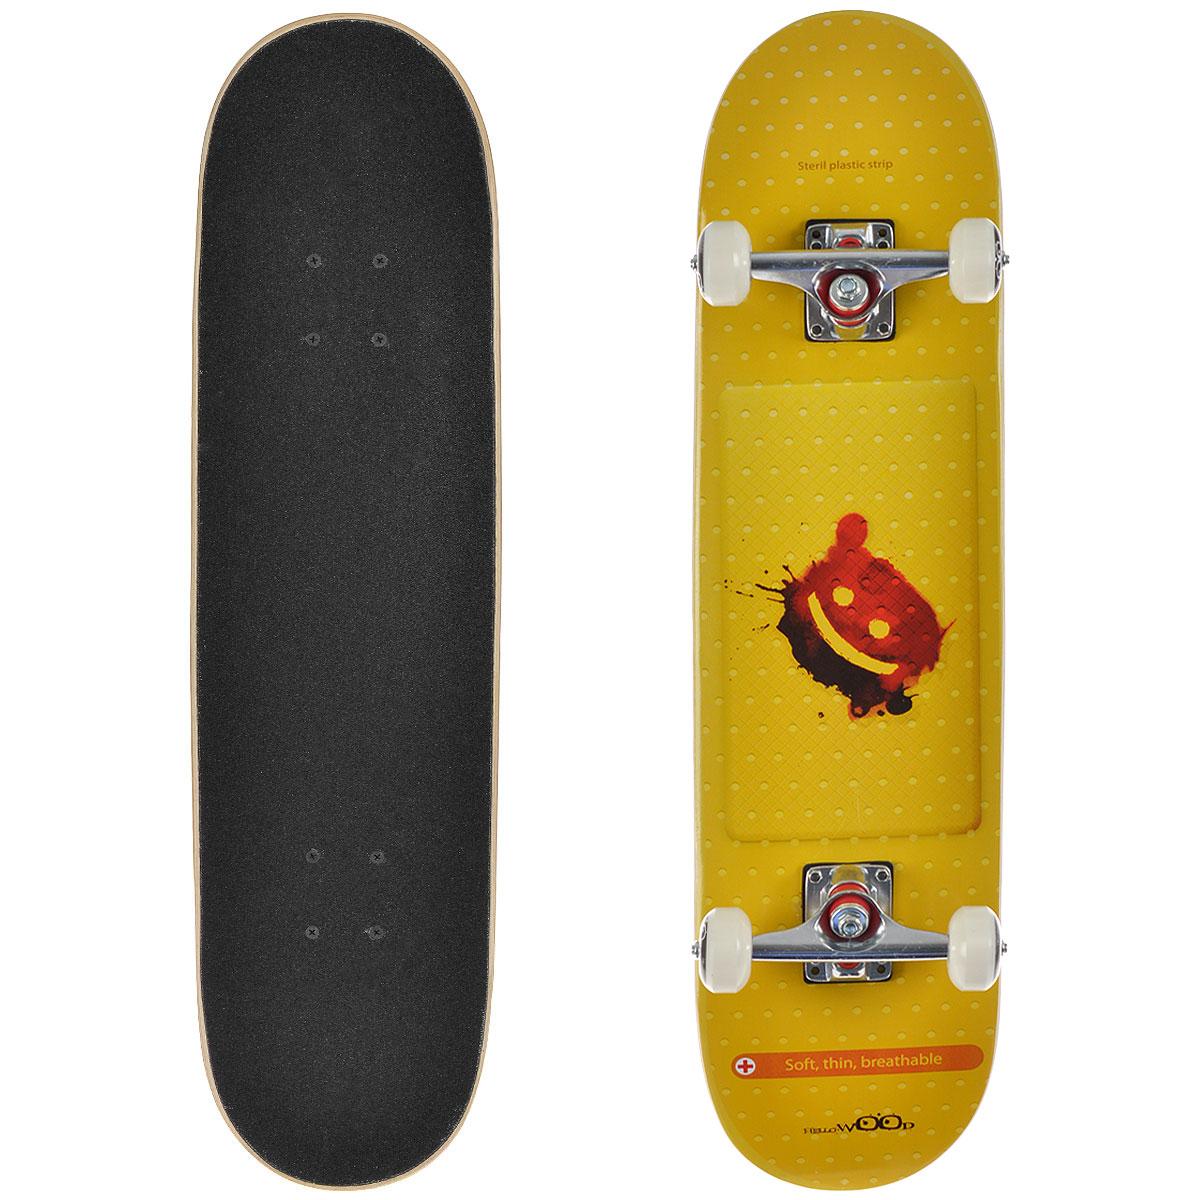 Скейтборд HelloWood Strip, дека 79 см х 20 см скейтборд пластиковый action цвет голубой дека 71 см х 19 см